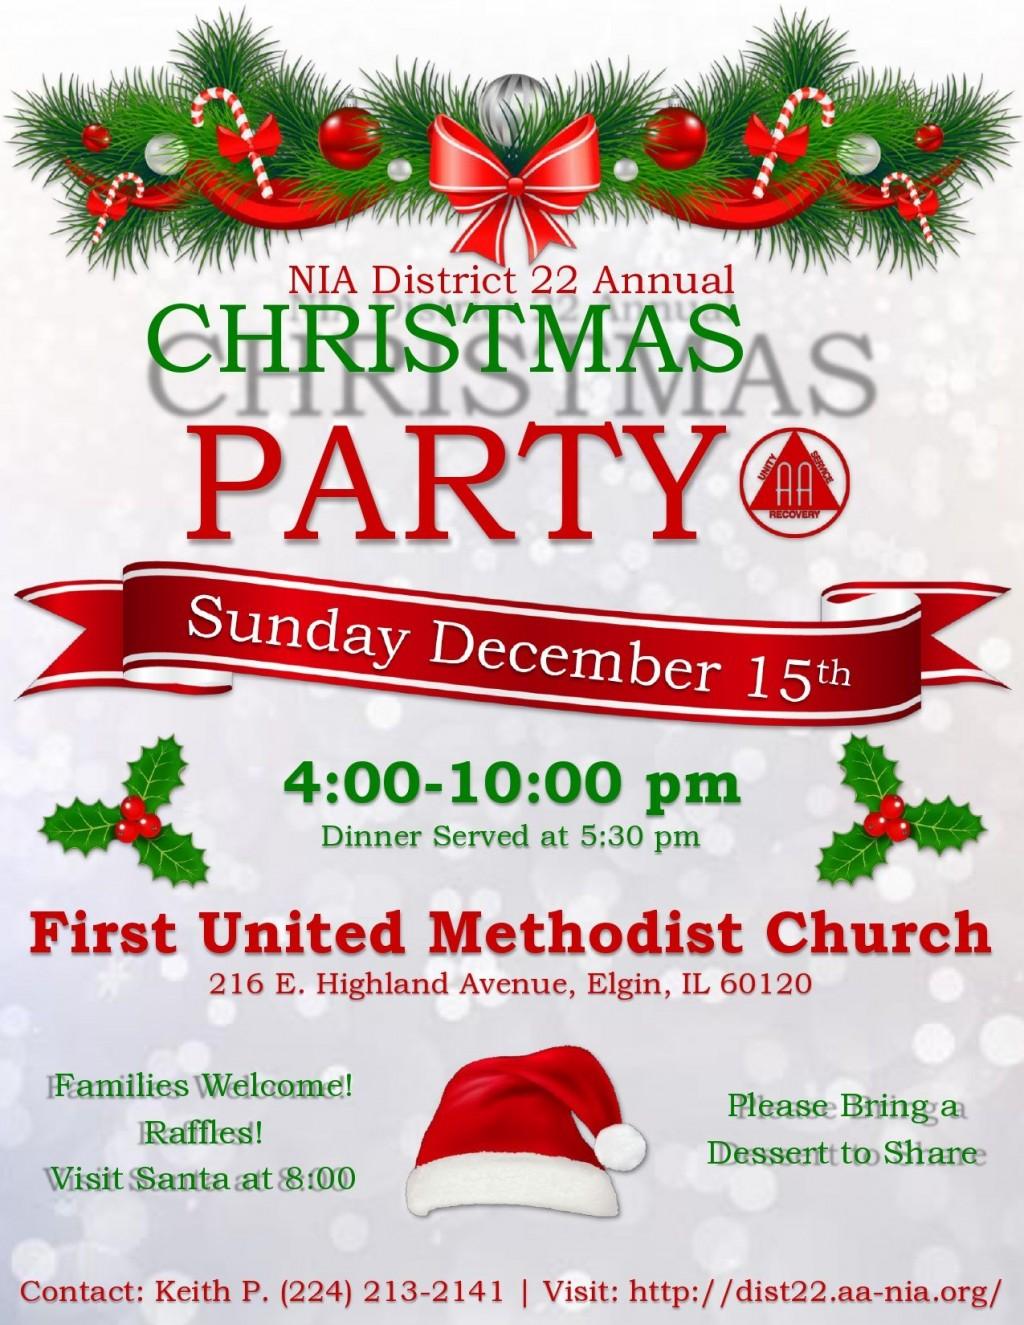 006 Phenomenal Free Church Christma Program Template Concept Large